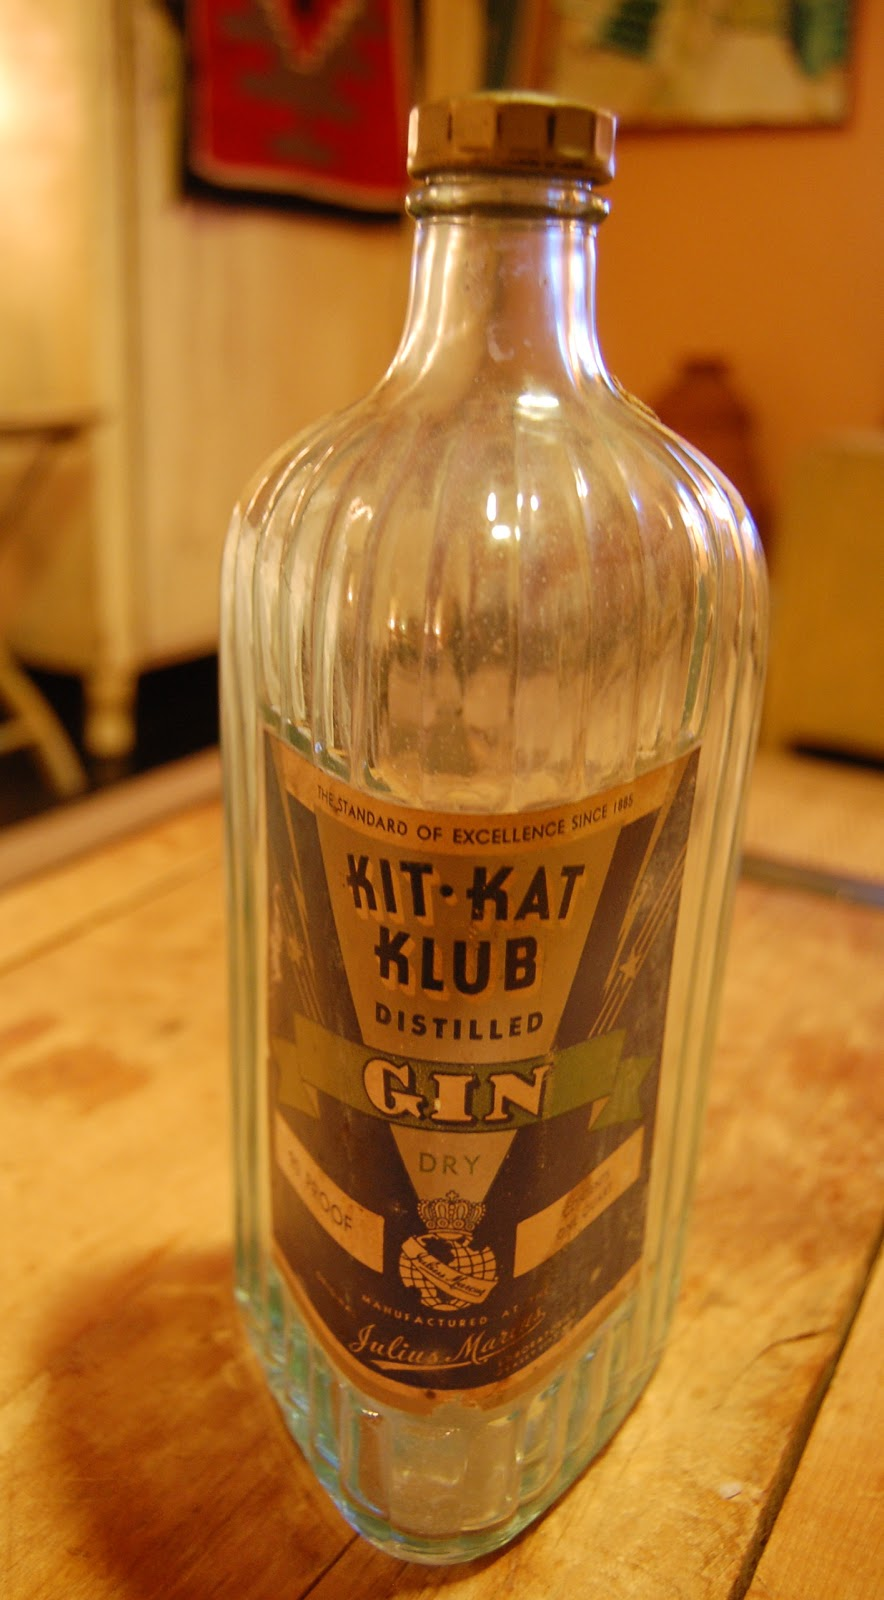 Art Deco Liquor Wunderful Club Kit-Kat Gin Things: Bottle